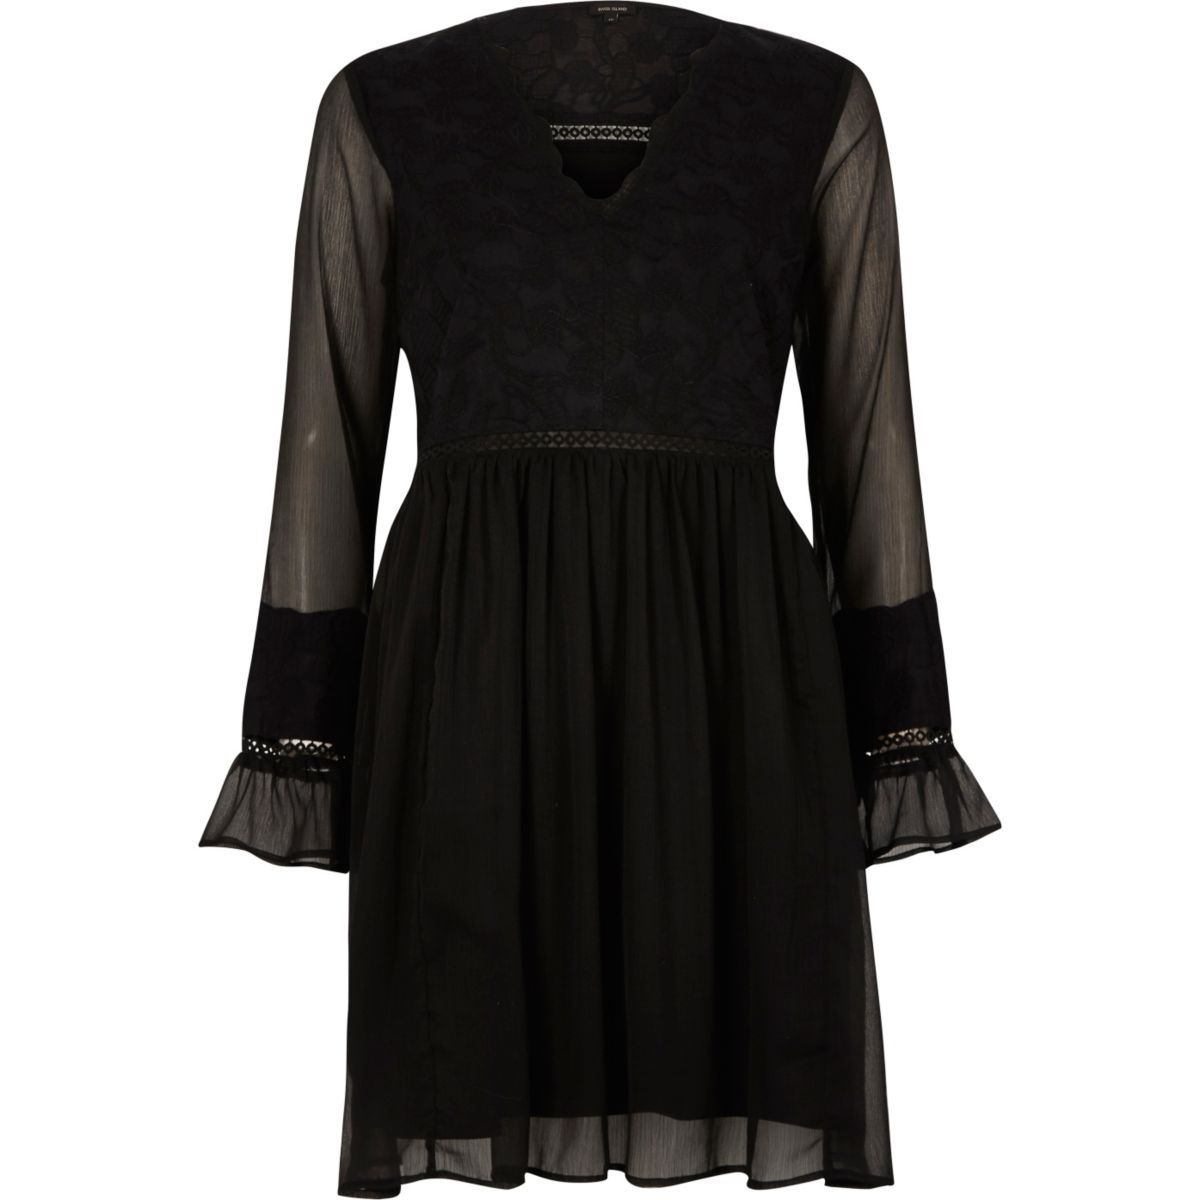 Black lace long sleeve smock dress